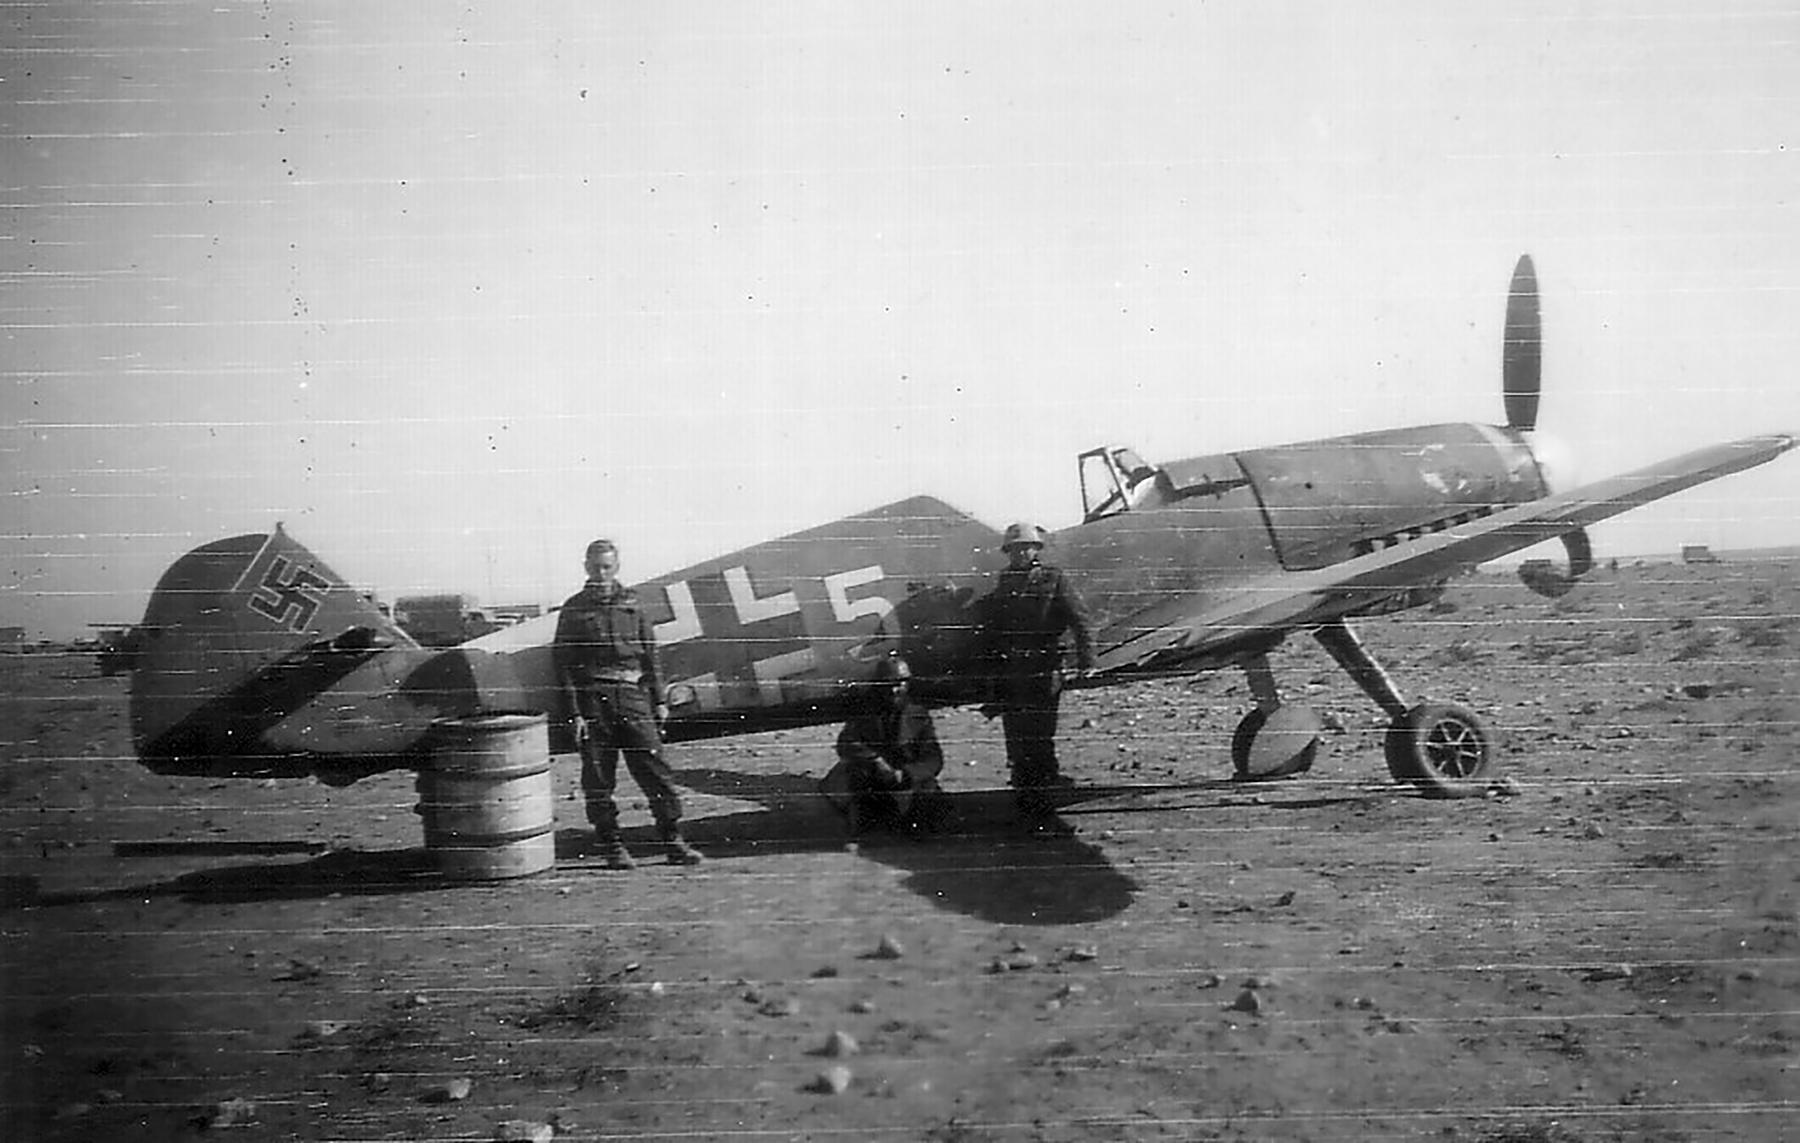 Messerschmitt Bf 109F4Trop 1.JG27 White 5 Albert Espenlaub crash landed El Adem Dec 1941 03